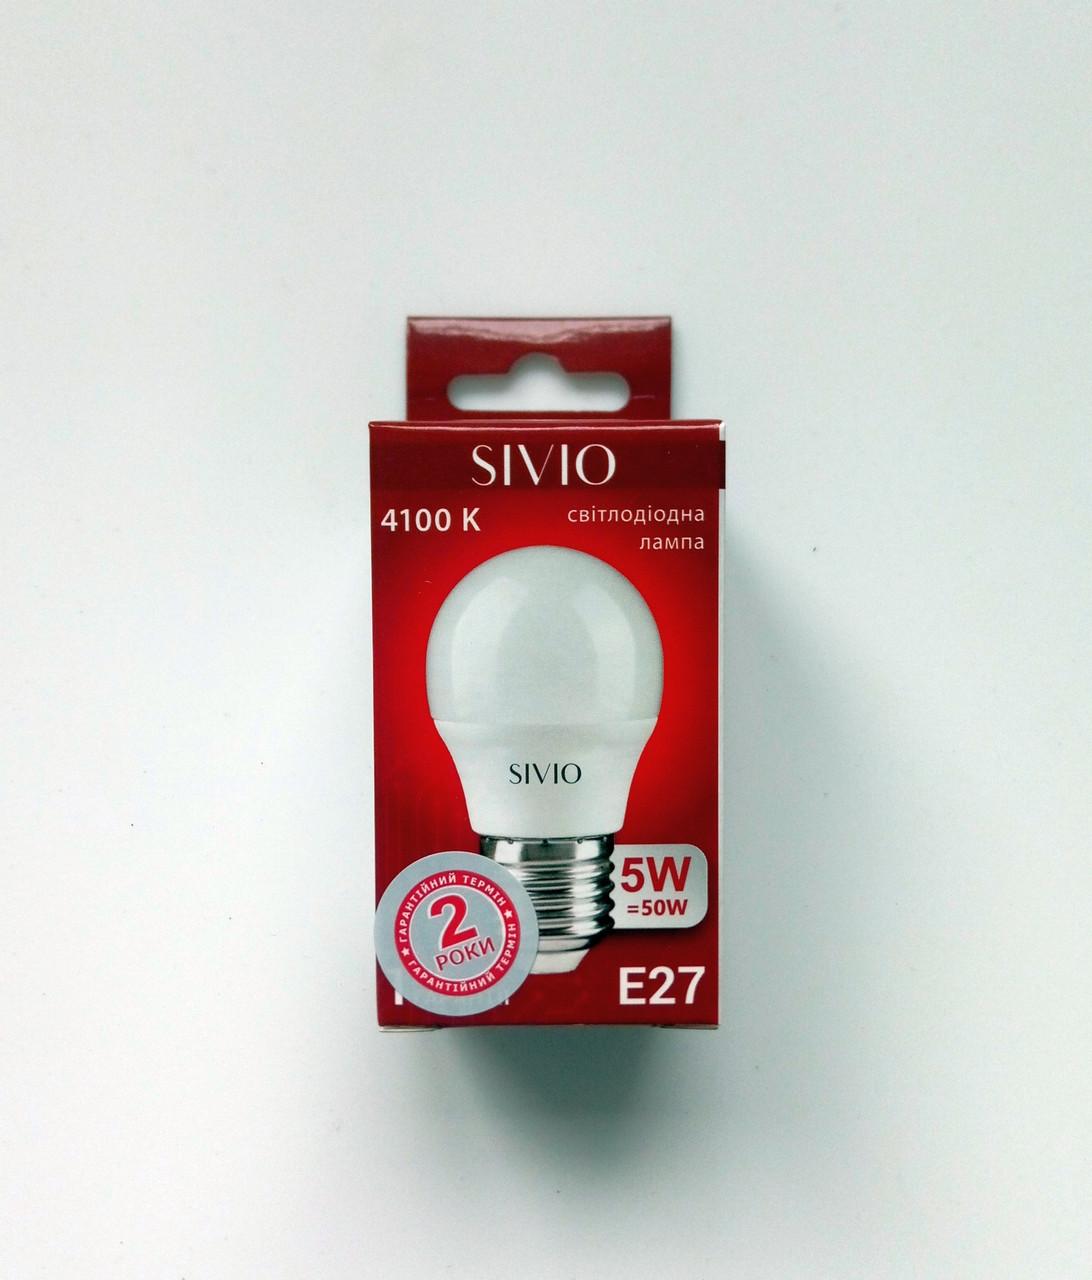 Світлодіодна лампа SIV-E27-G45-5W-3000К/4100K 450Lm куля, матова